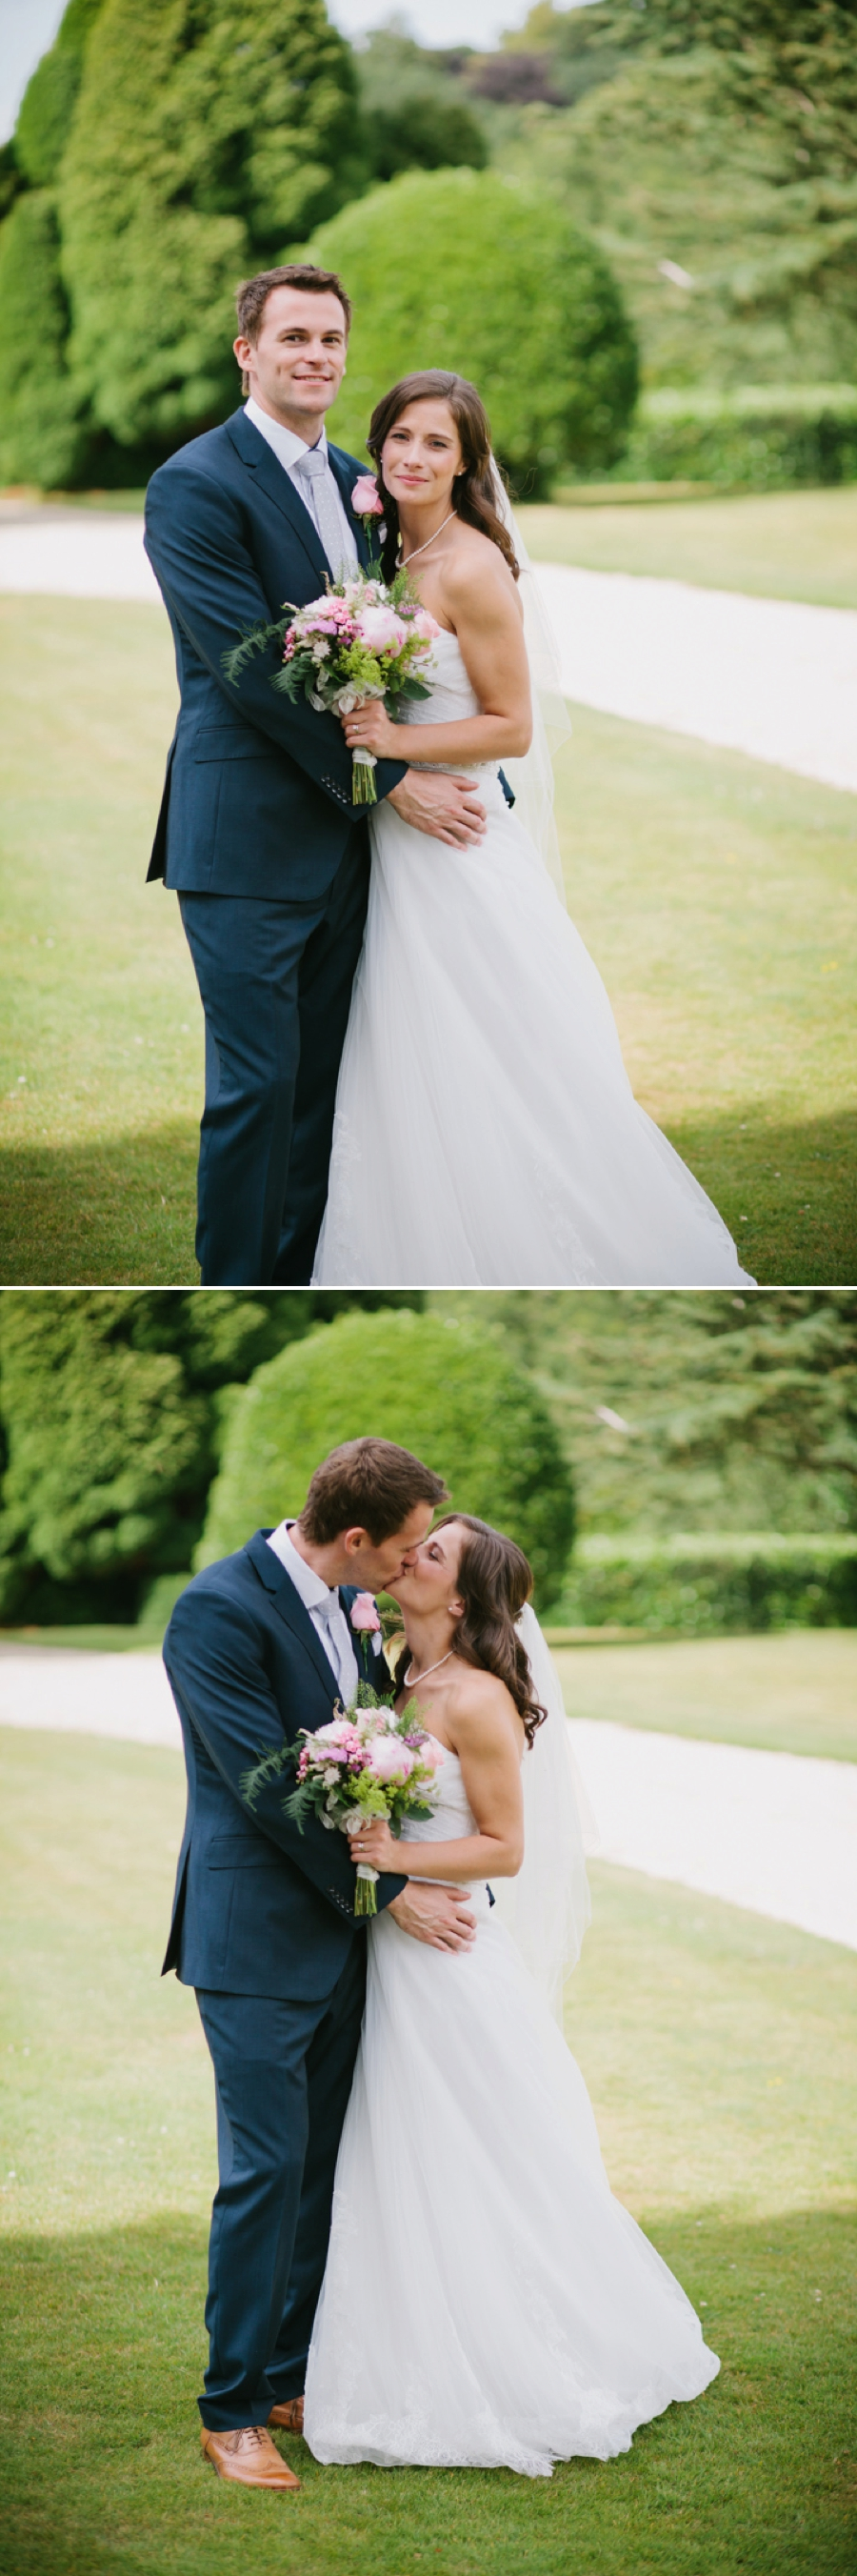 Cheshire Wedding Photographer Huntsham Court Wedding Julie and Chris_0114